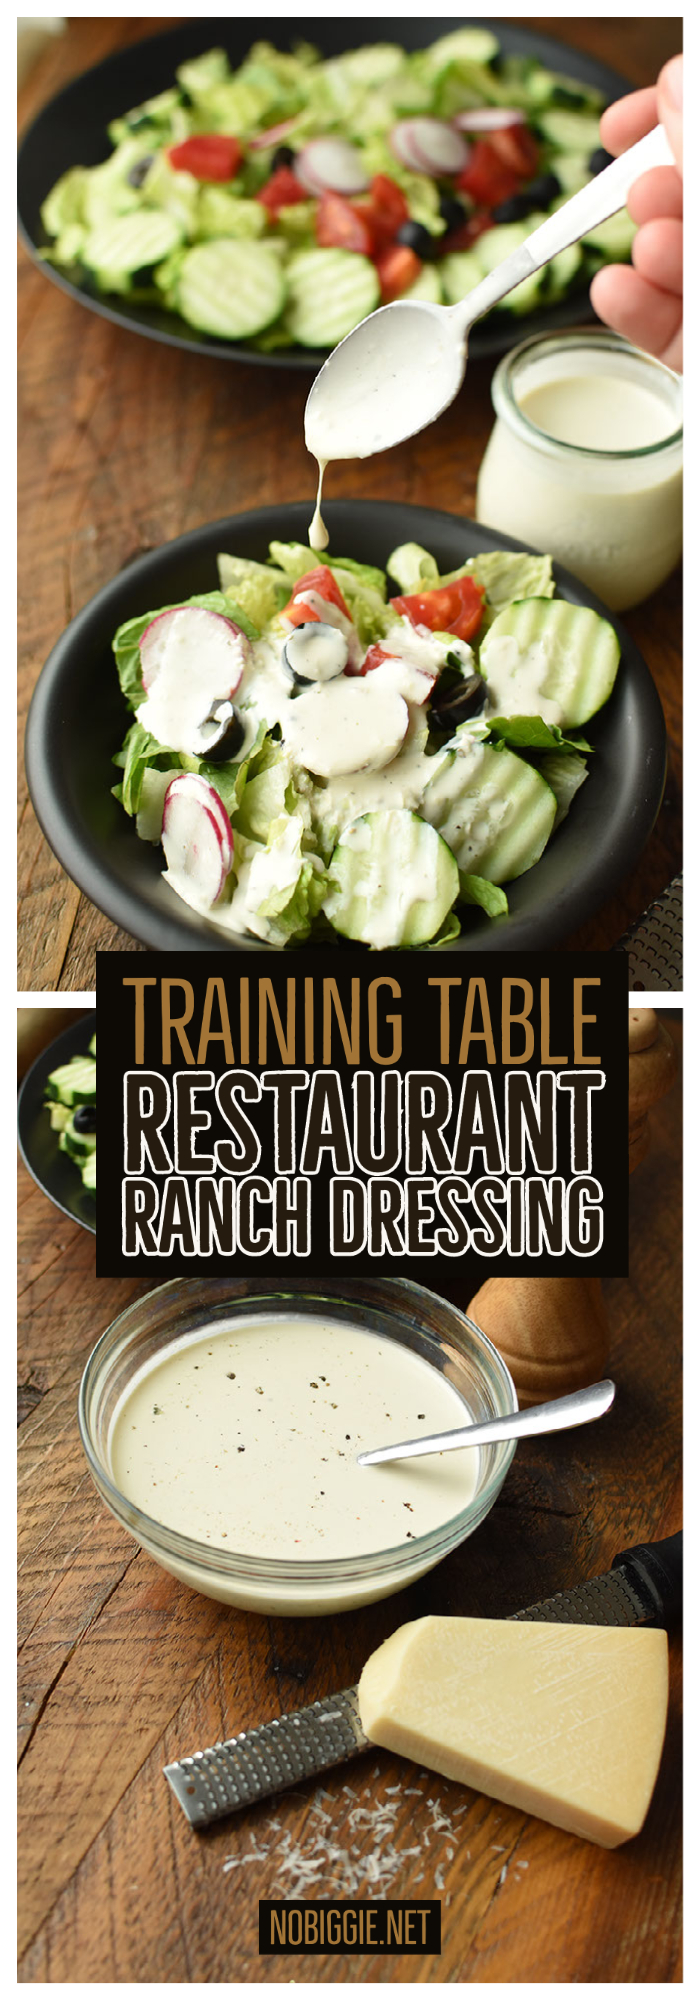 Training Table Restaurant Ranch Dressing Nobiggie